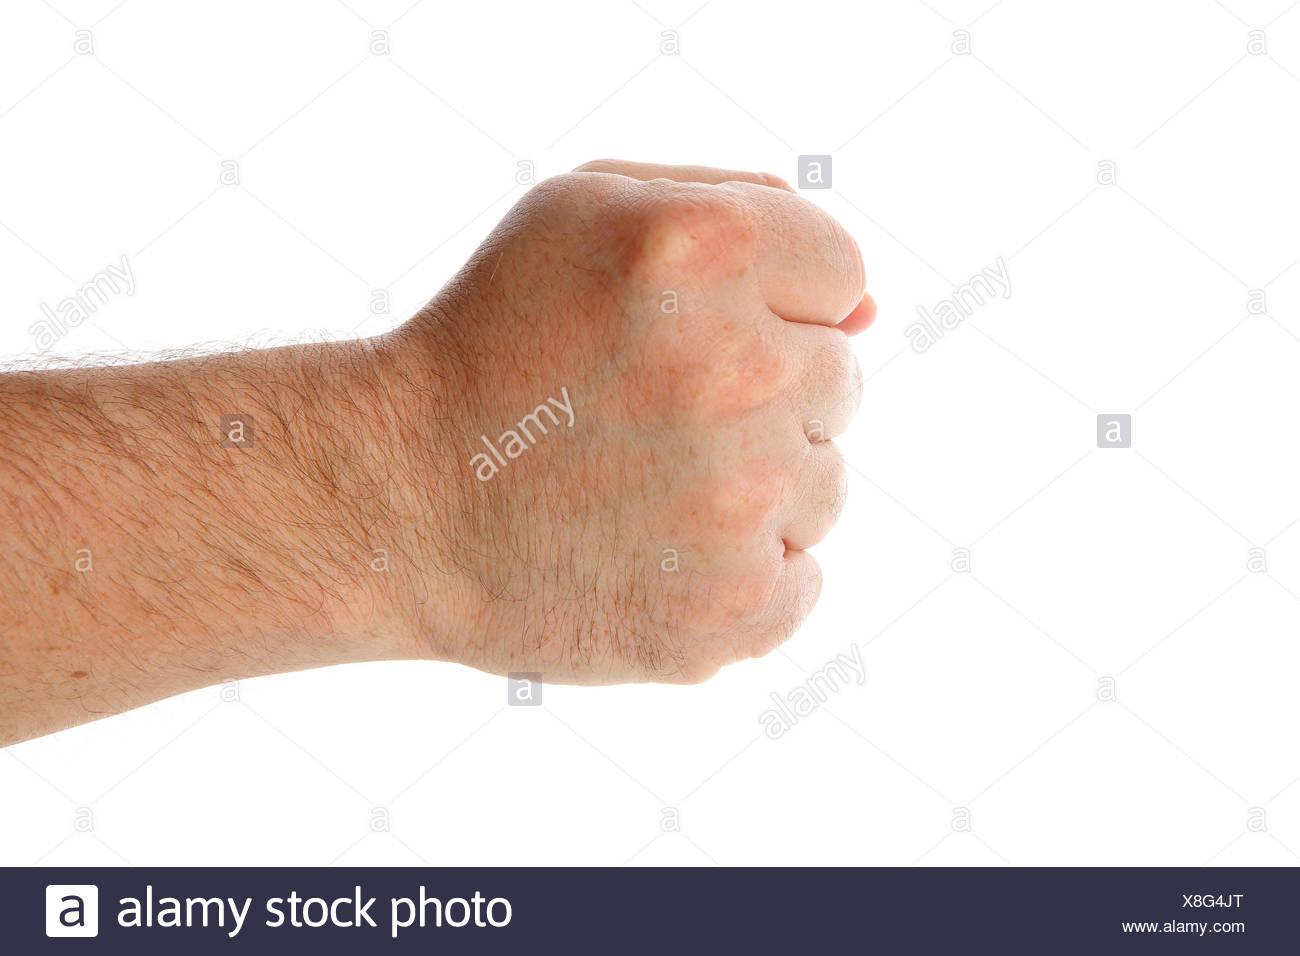 fist - Stock Image